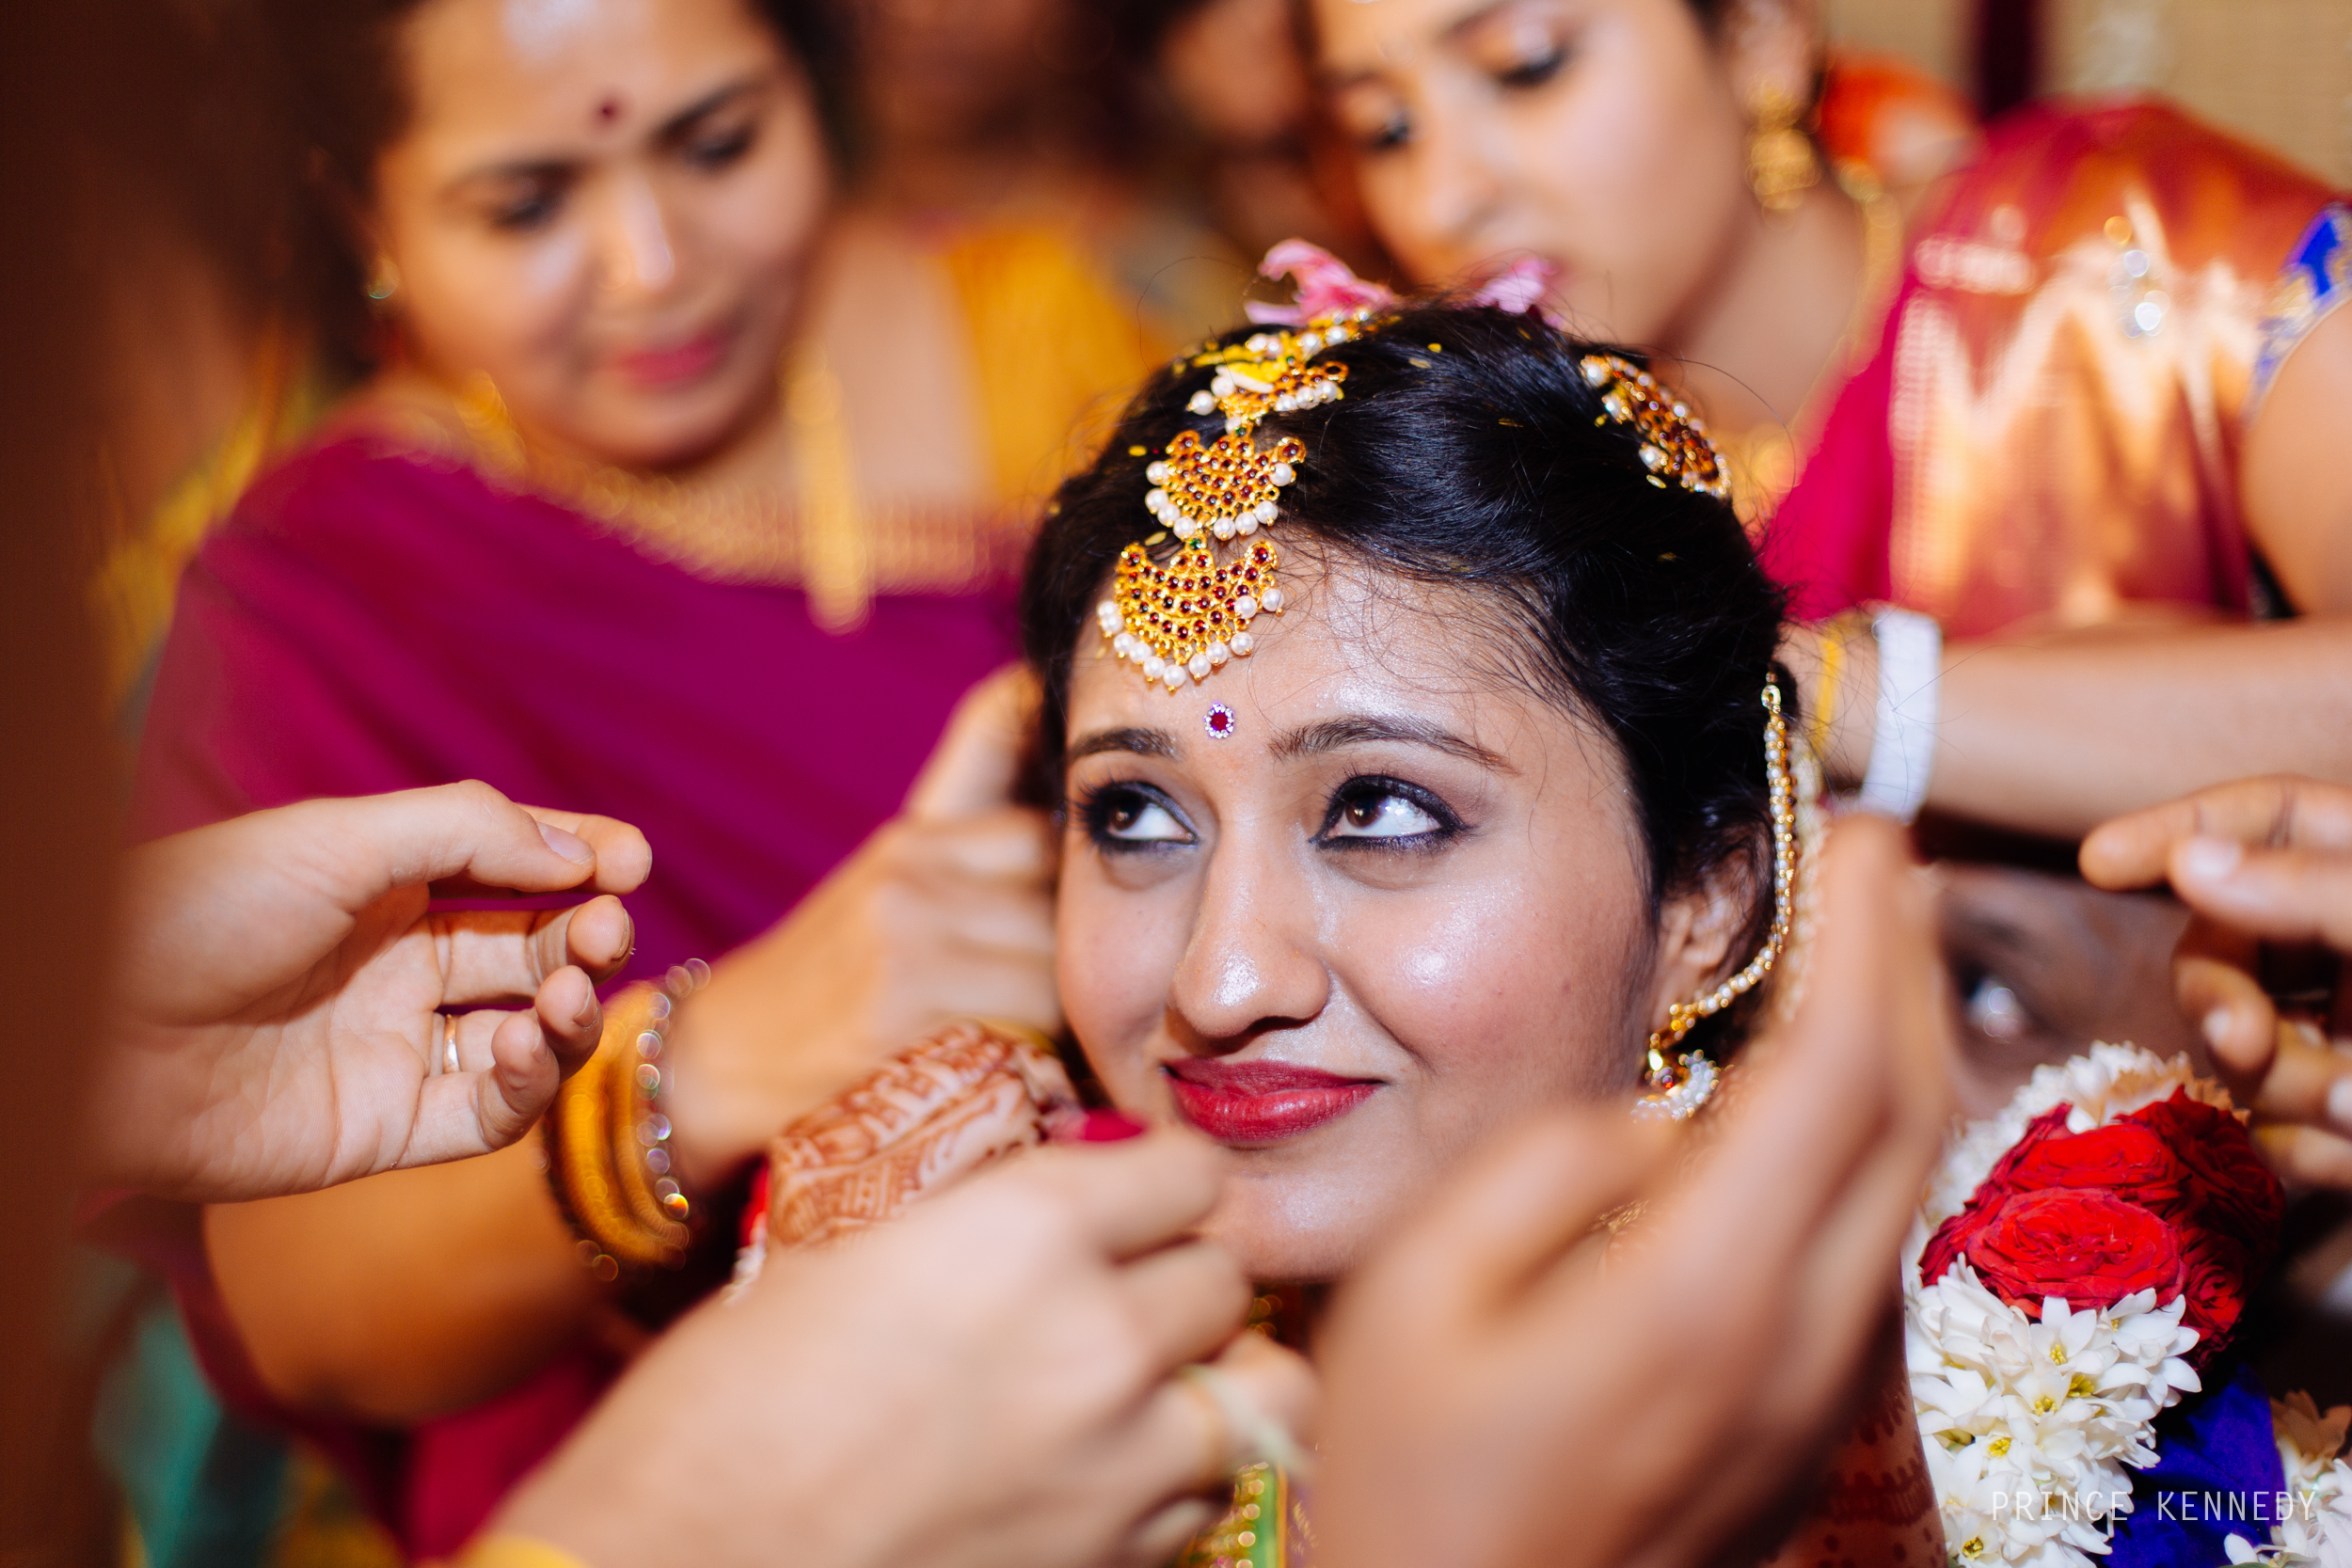 Athmajja-Nithesh-Engagement-Couple-Portrait-Portraiture-Wedding-Couple-Portrait-Chennai-Photographer-Candid-Photography-Destination-Best-Prince-Kennedy-Photography-298.jpg